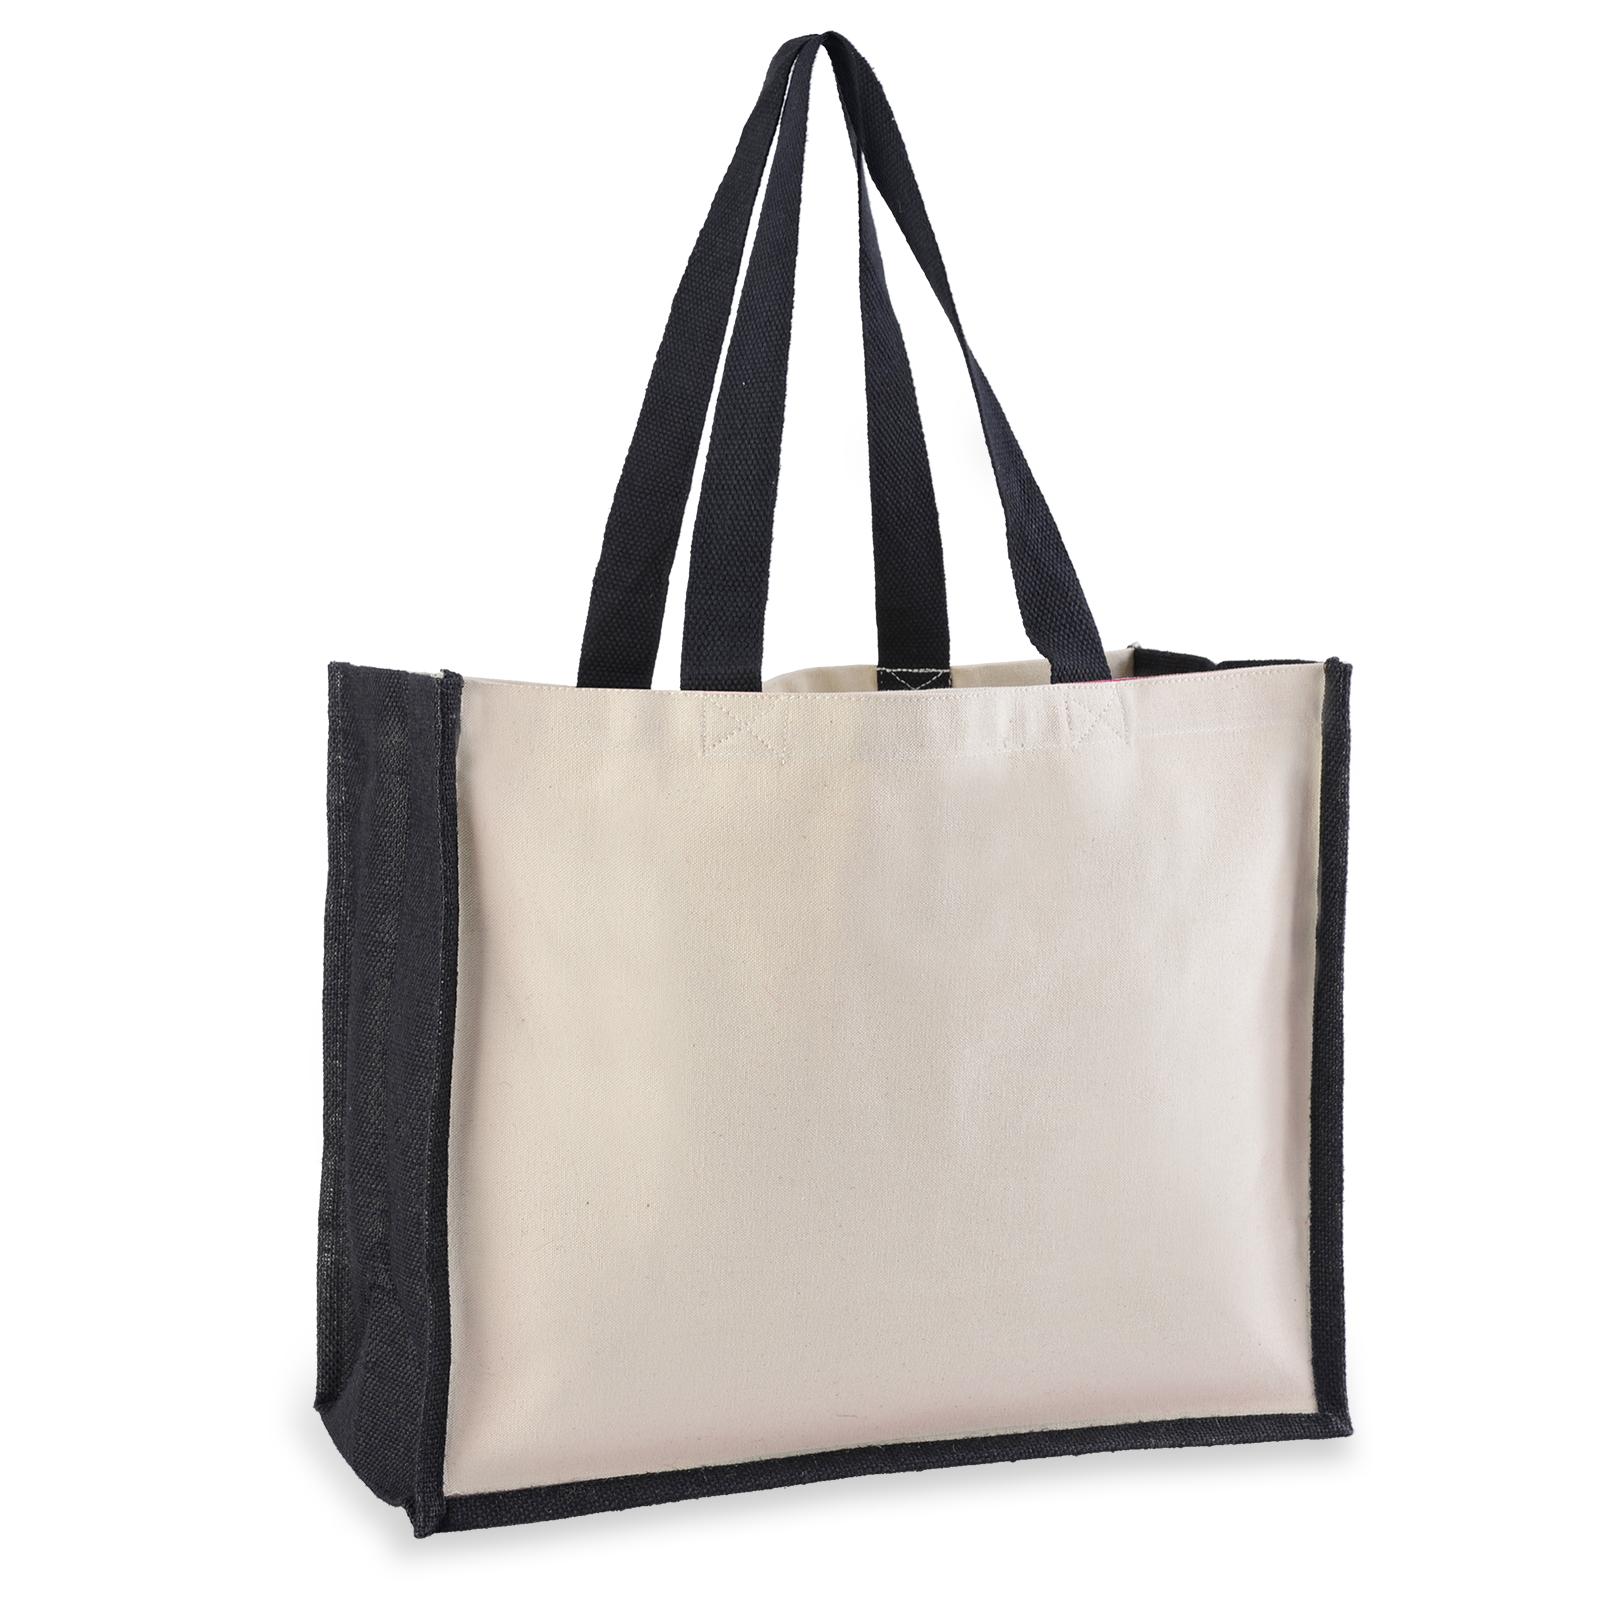 MQ-00089-noir-F16-sac-plage-coton-ecru-noir